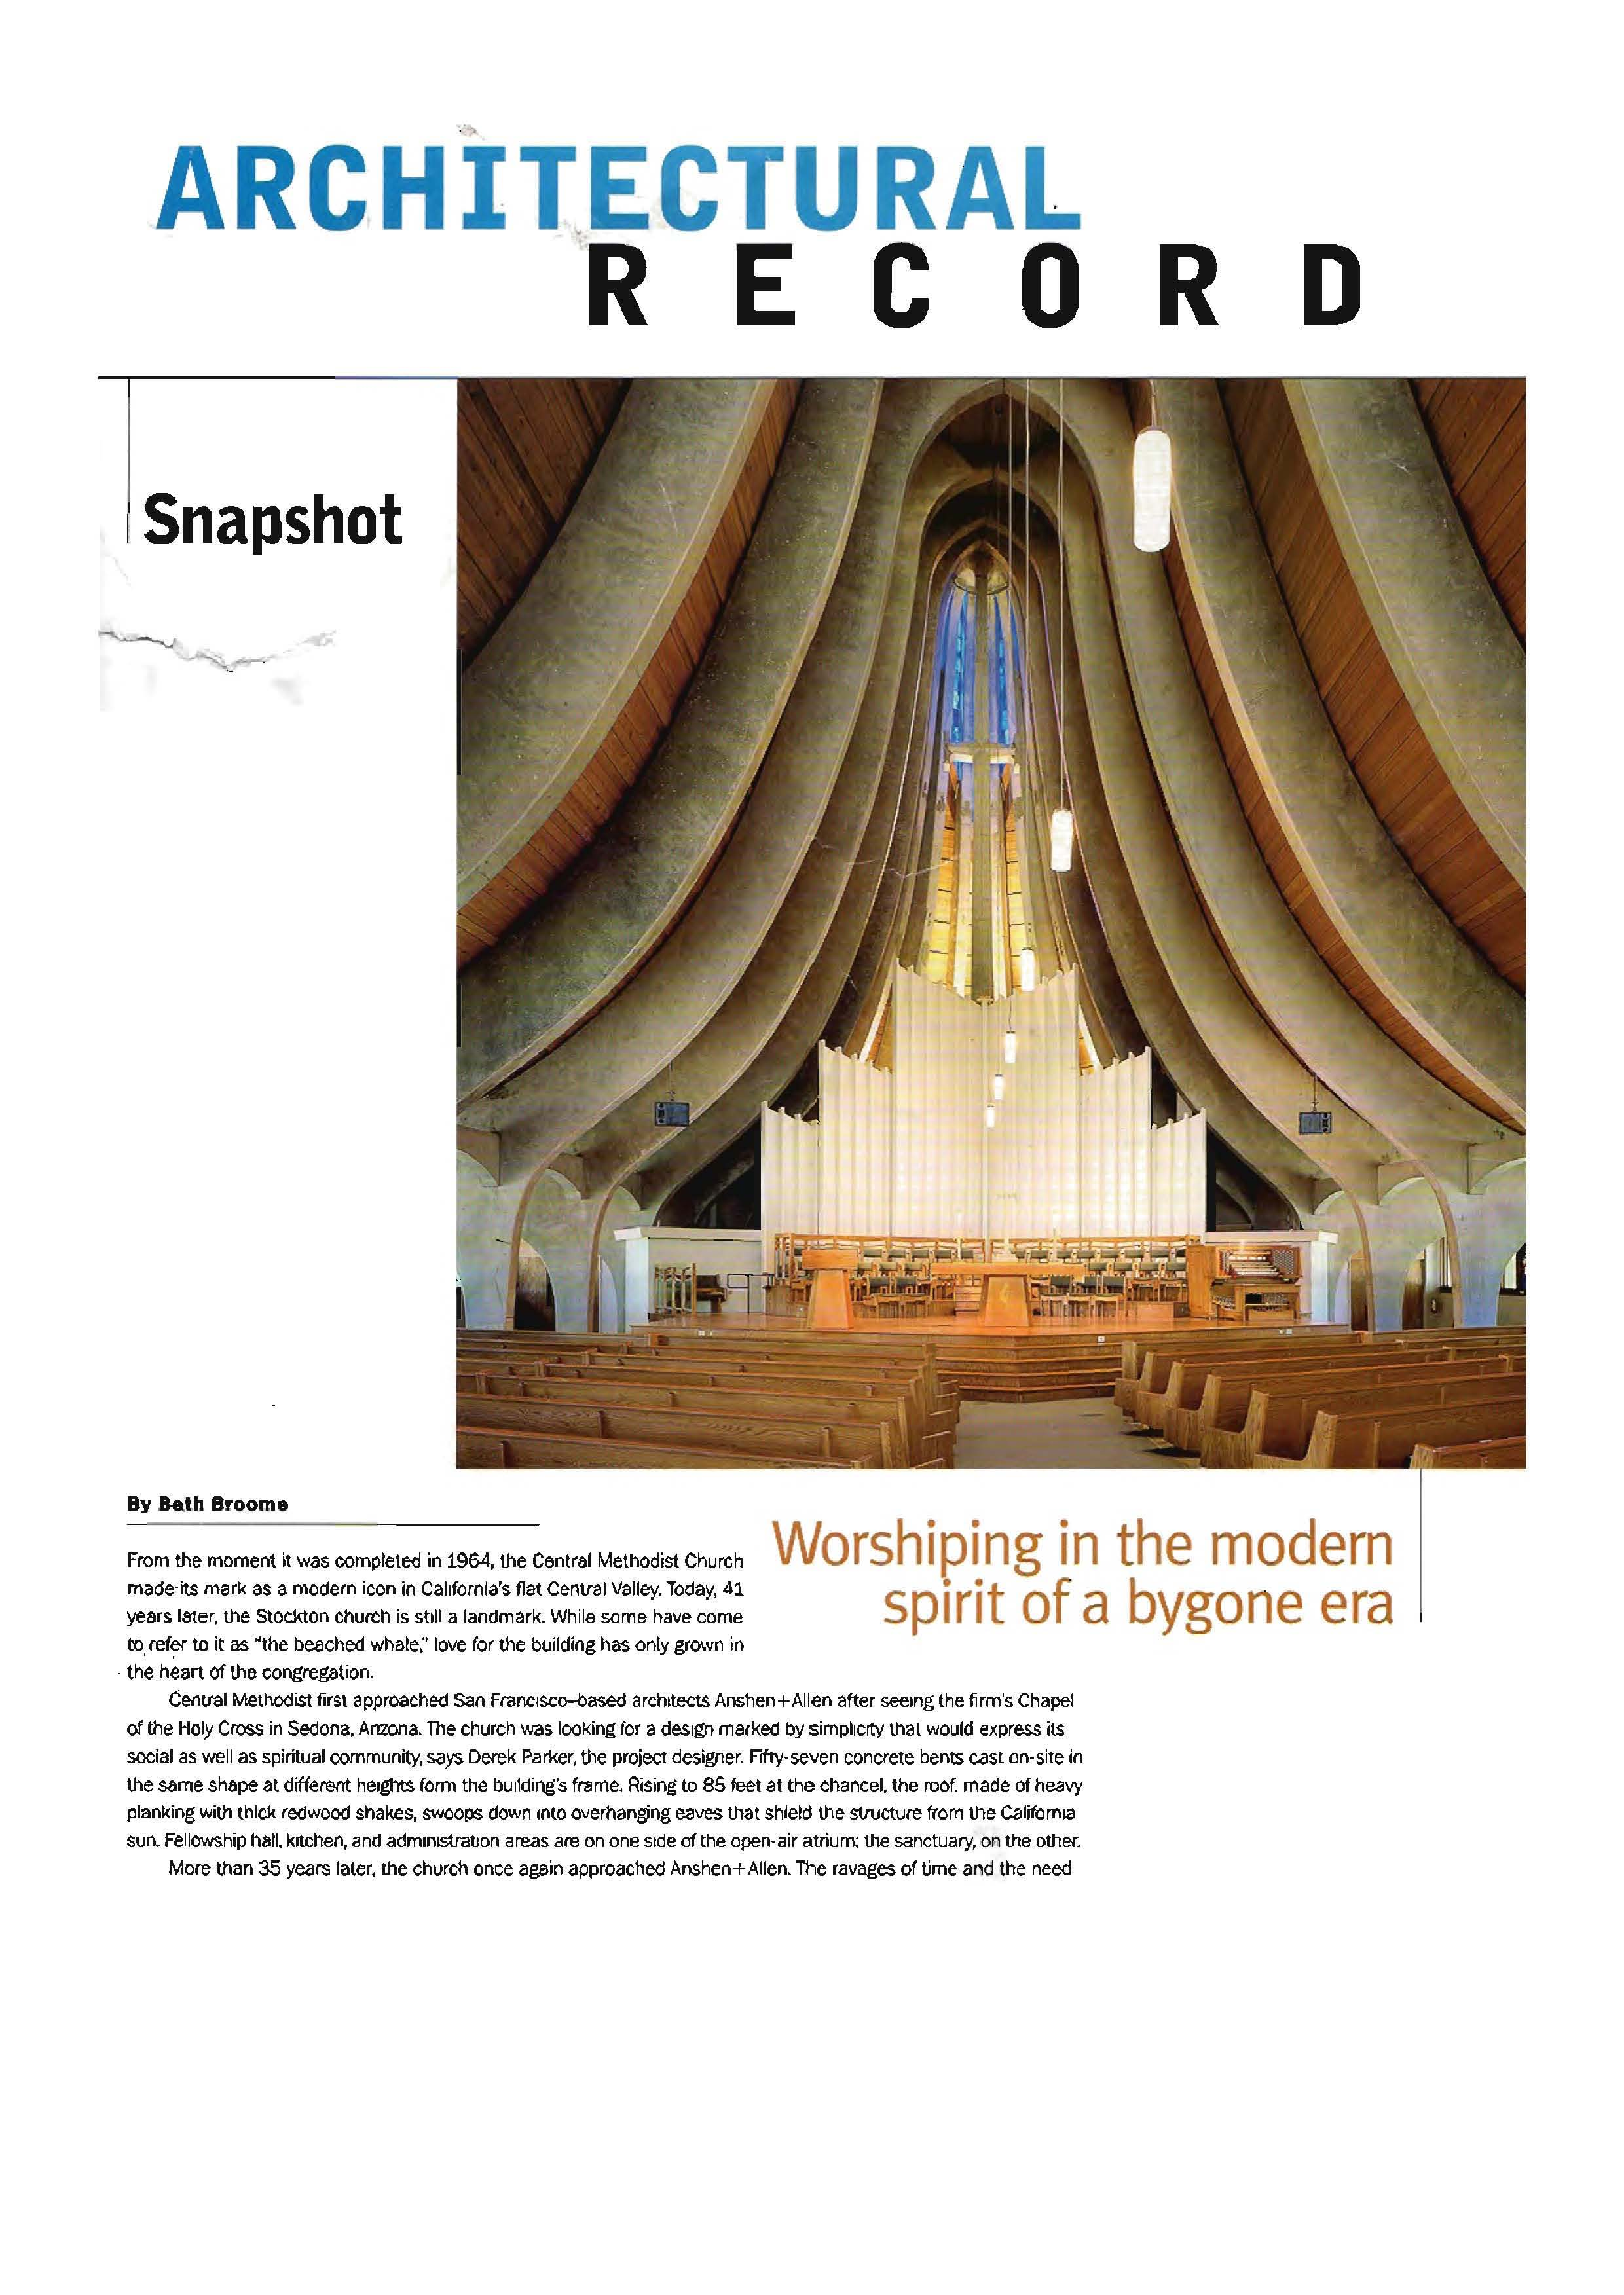 Central Methodist Church: Worshipping with a modern spirit in a bygone era